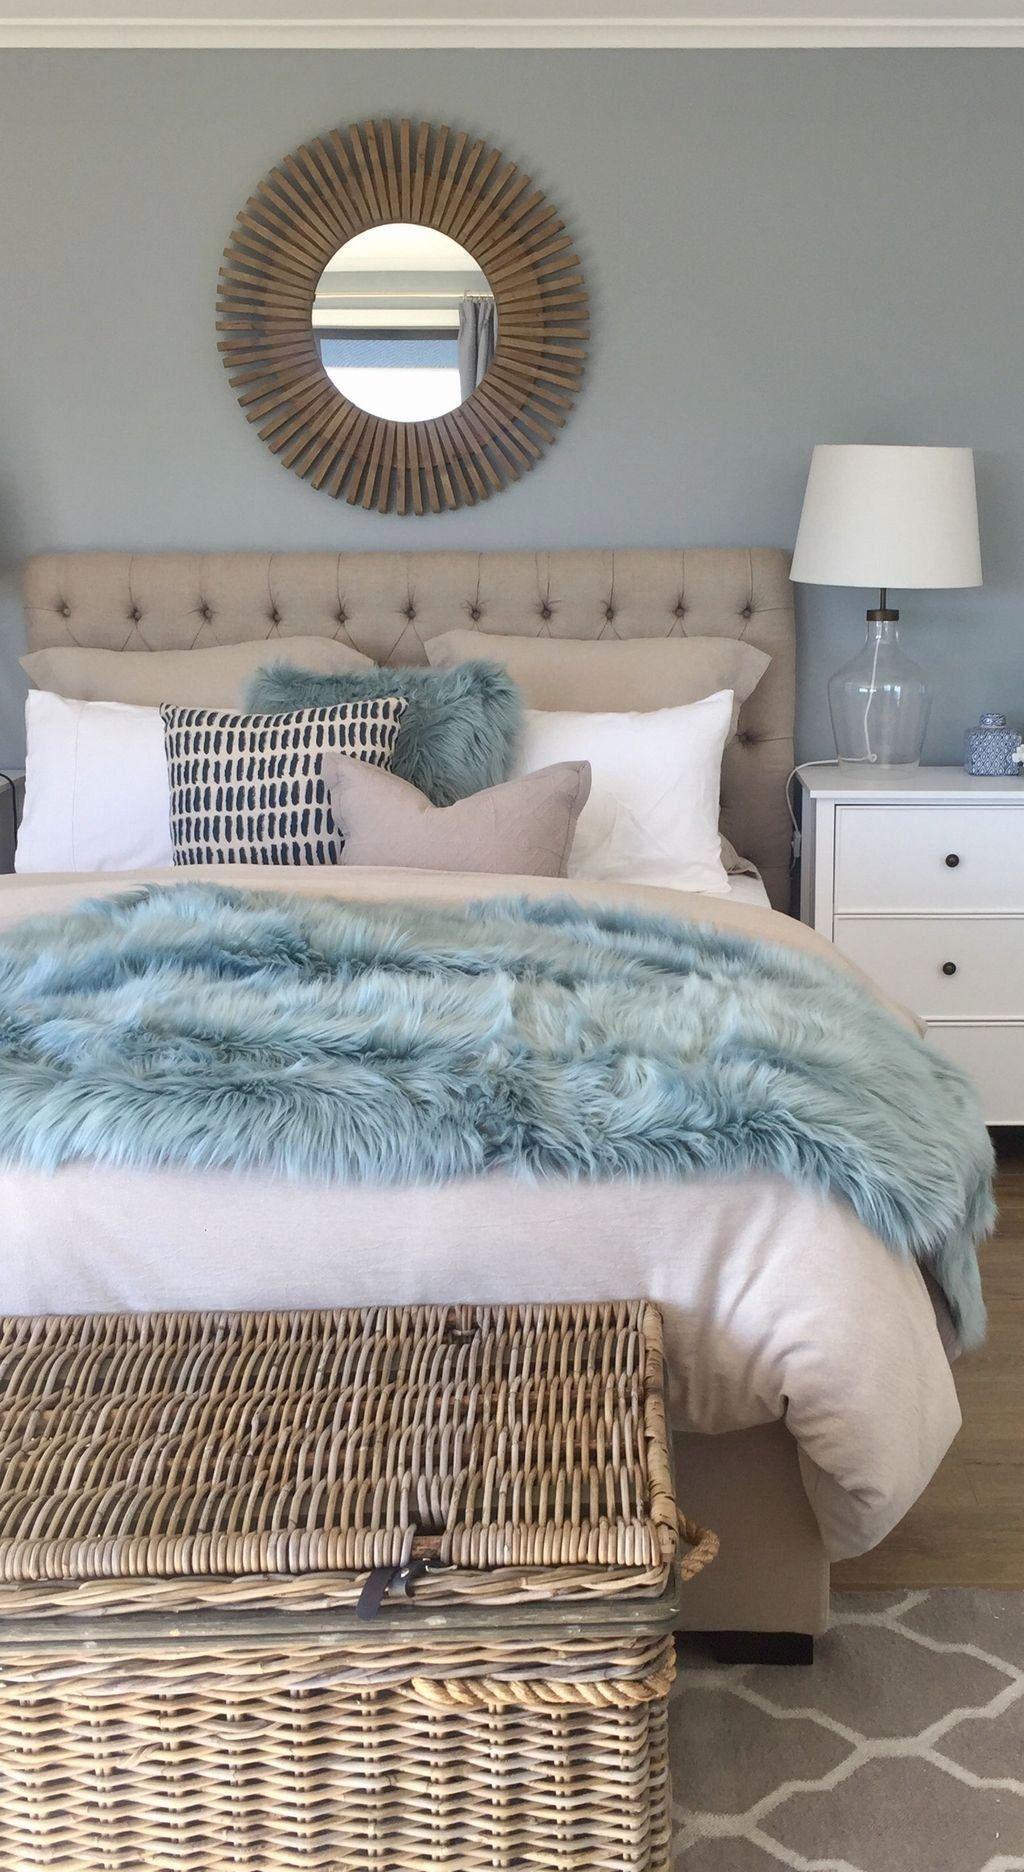 49+ Beach bedroom furniture ideas info